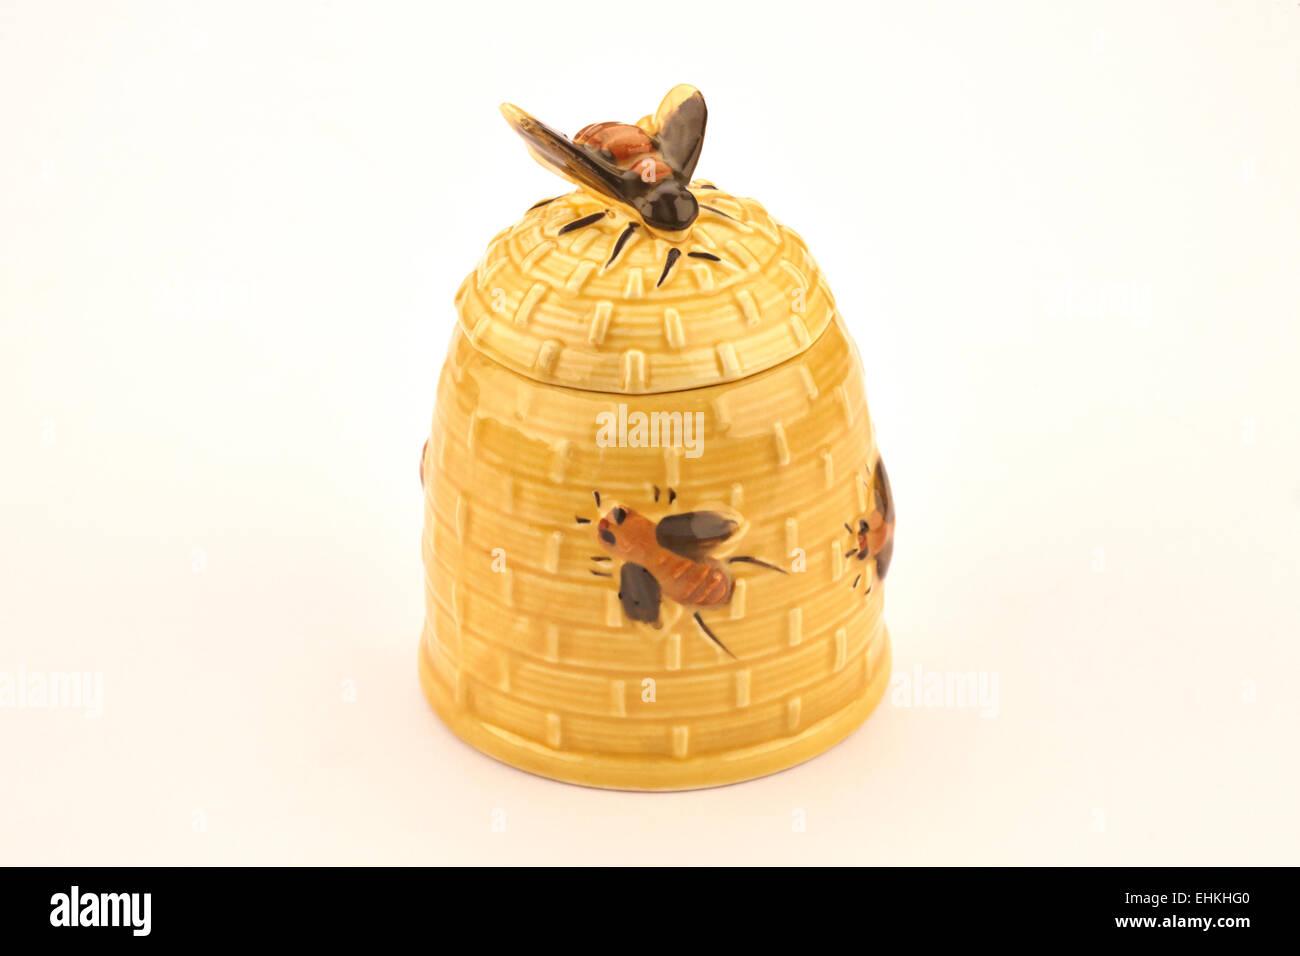 Pottery Honey Pot Ceramic Jar with Lid Honey Jar Rustic Pottery Pottery Honey Pot Ceramic Honey Jar